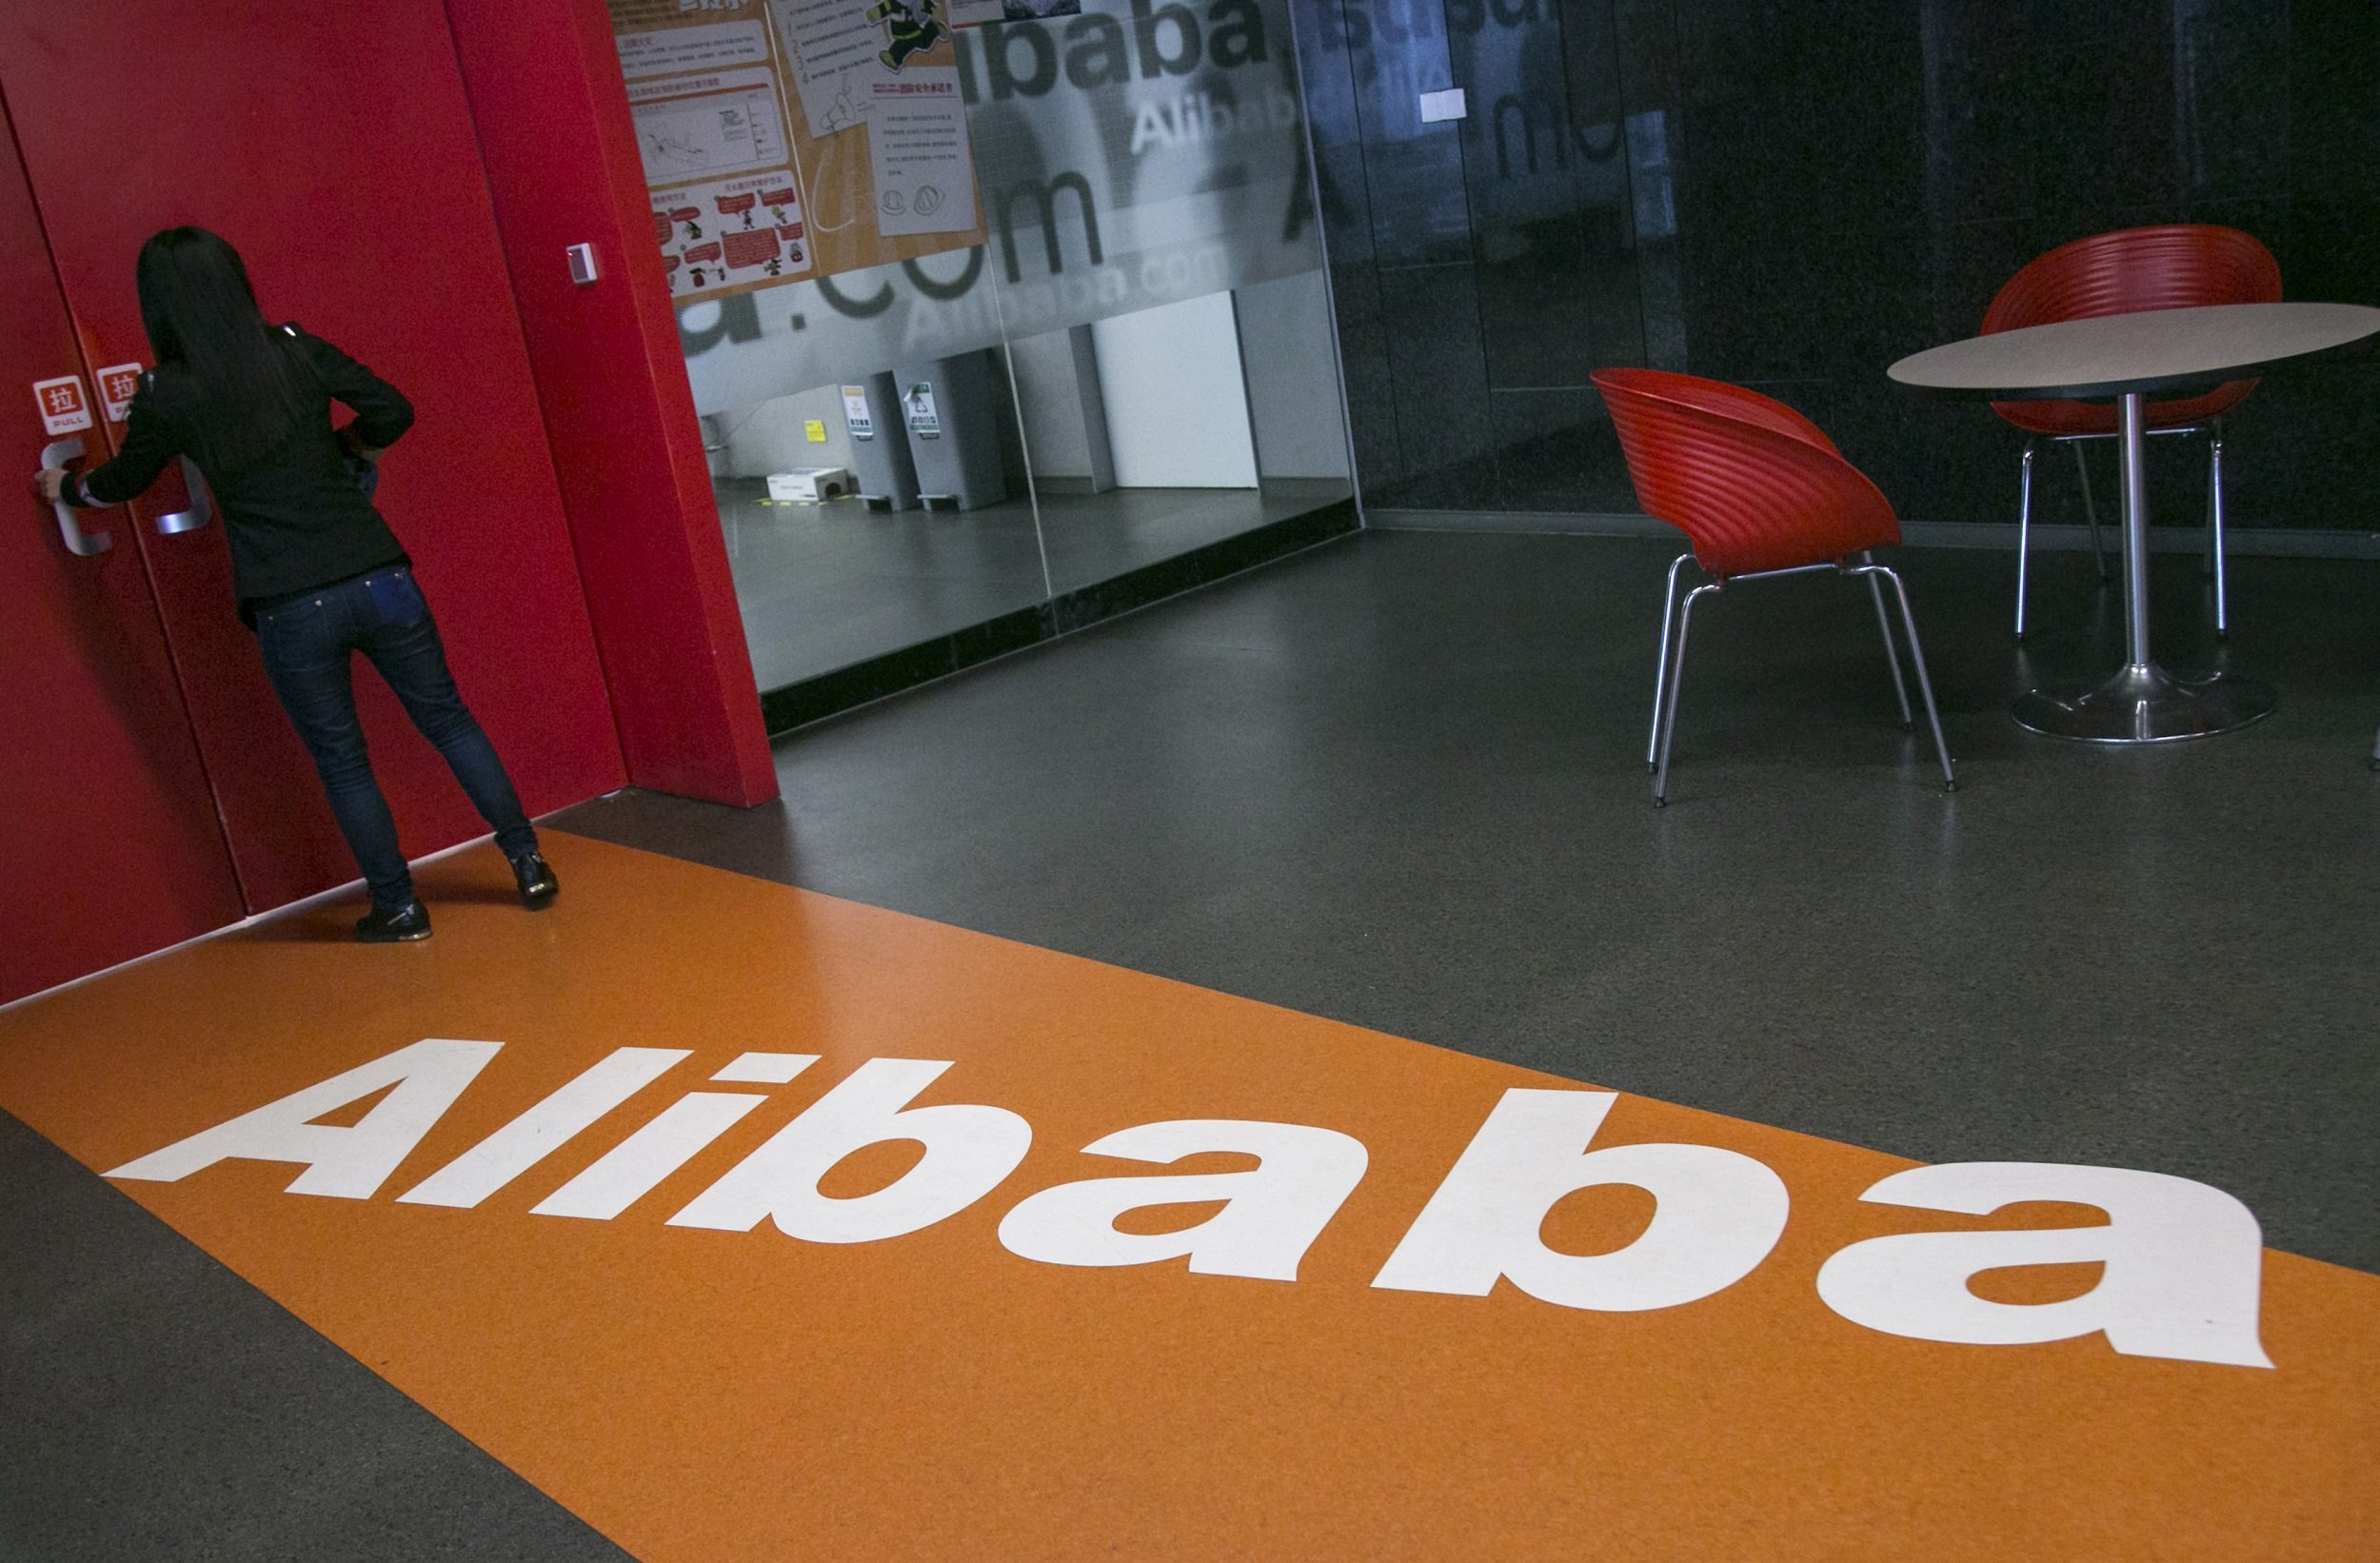 Alibaba: The $200 Billion 'Open Sesame' Alibaba